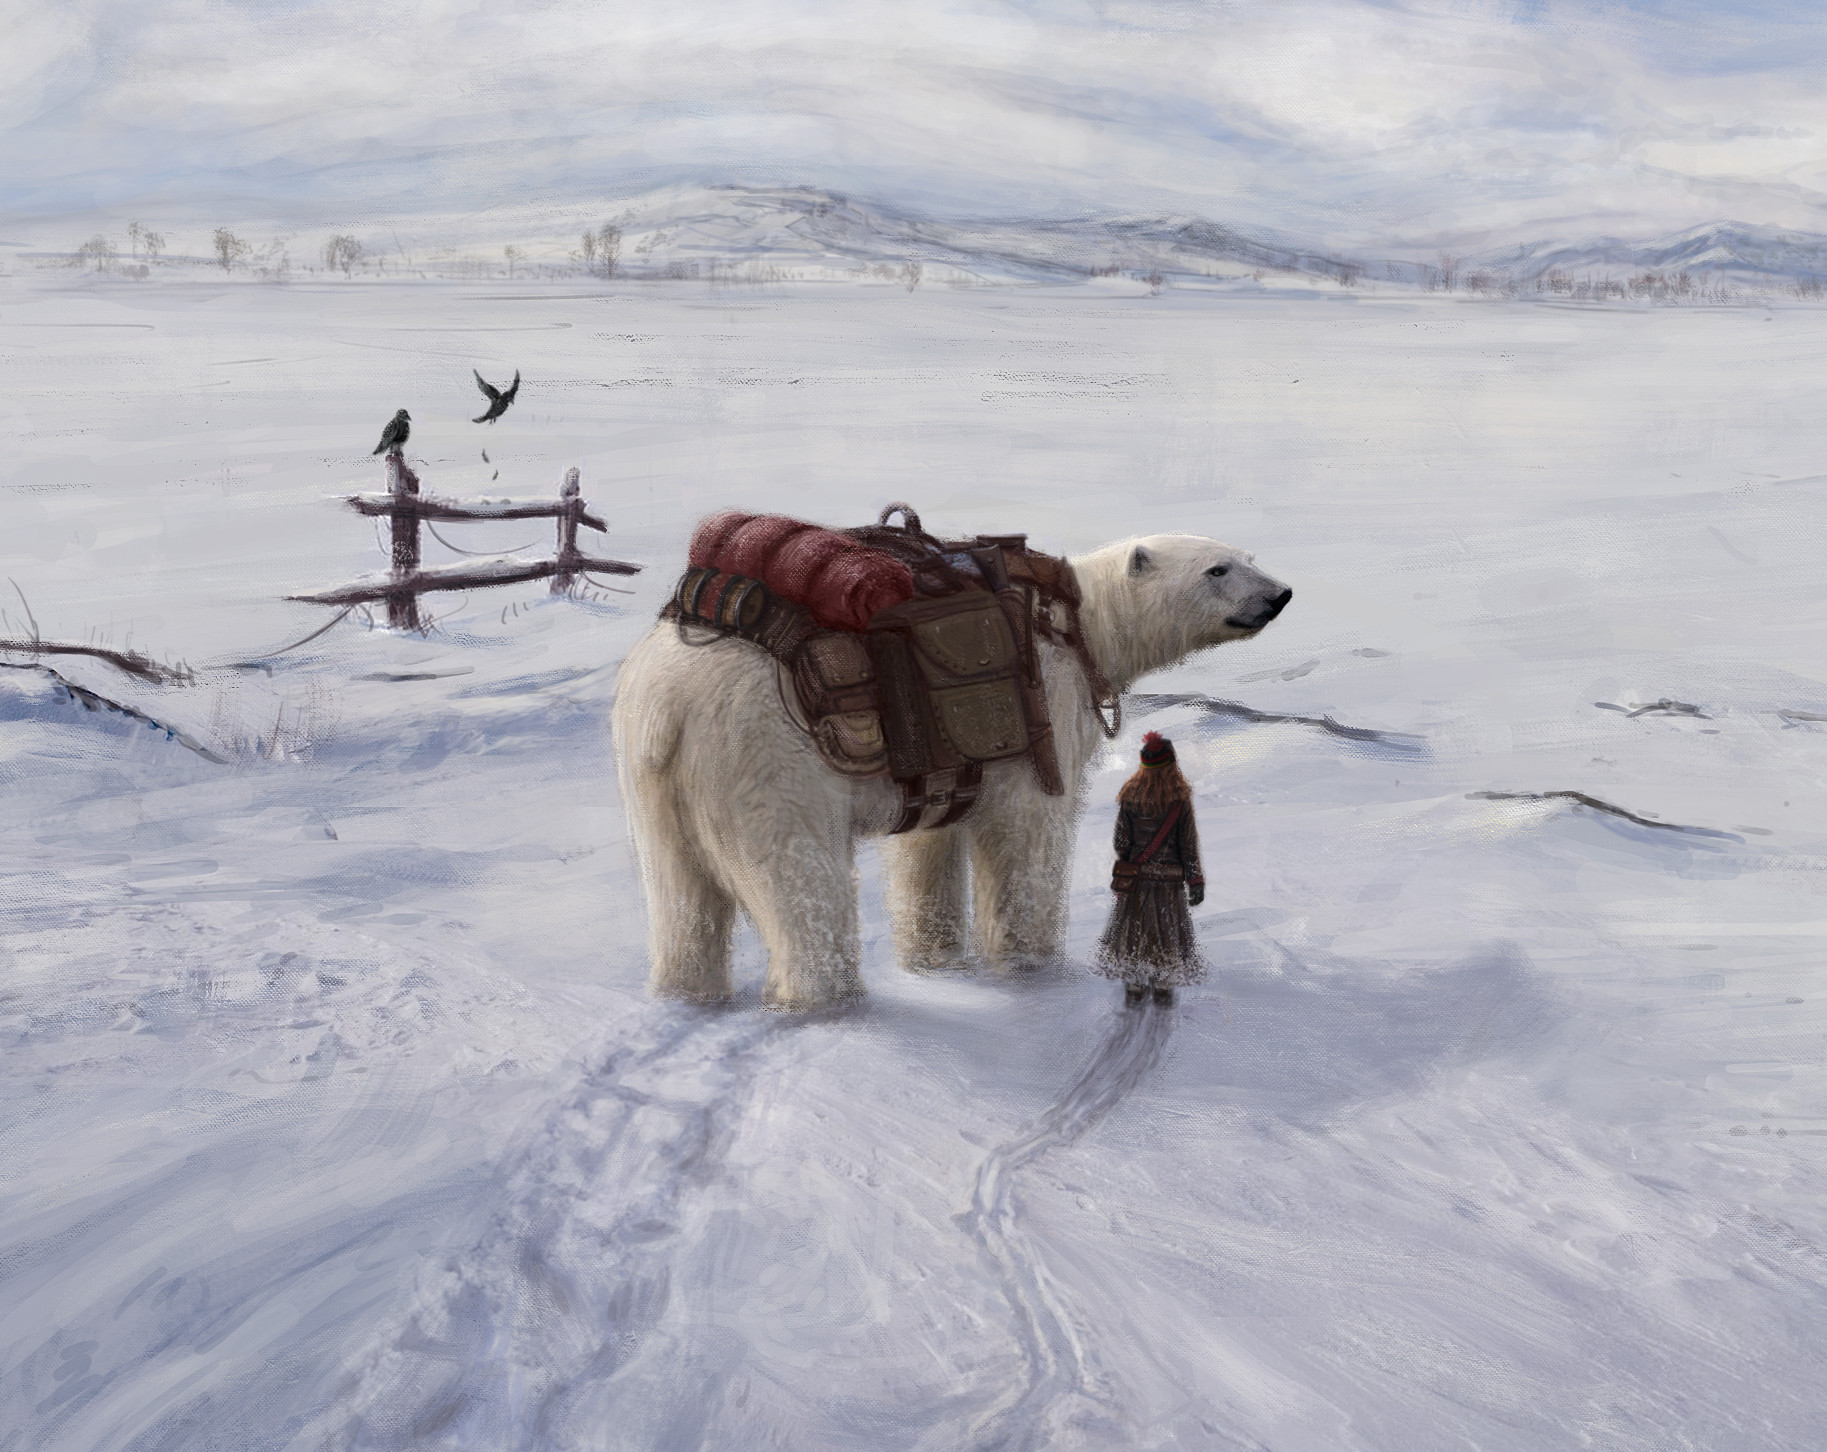 Martin seidl the girl and the ice bear nb